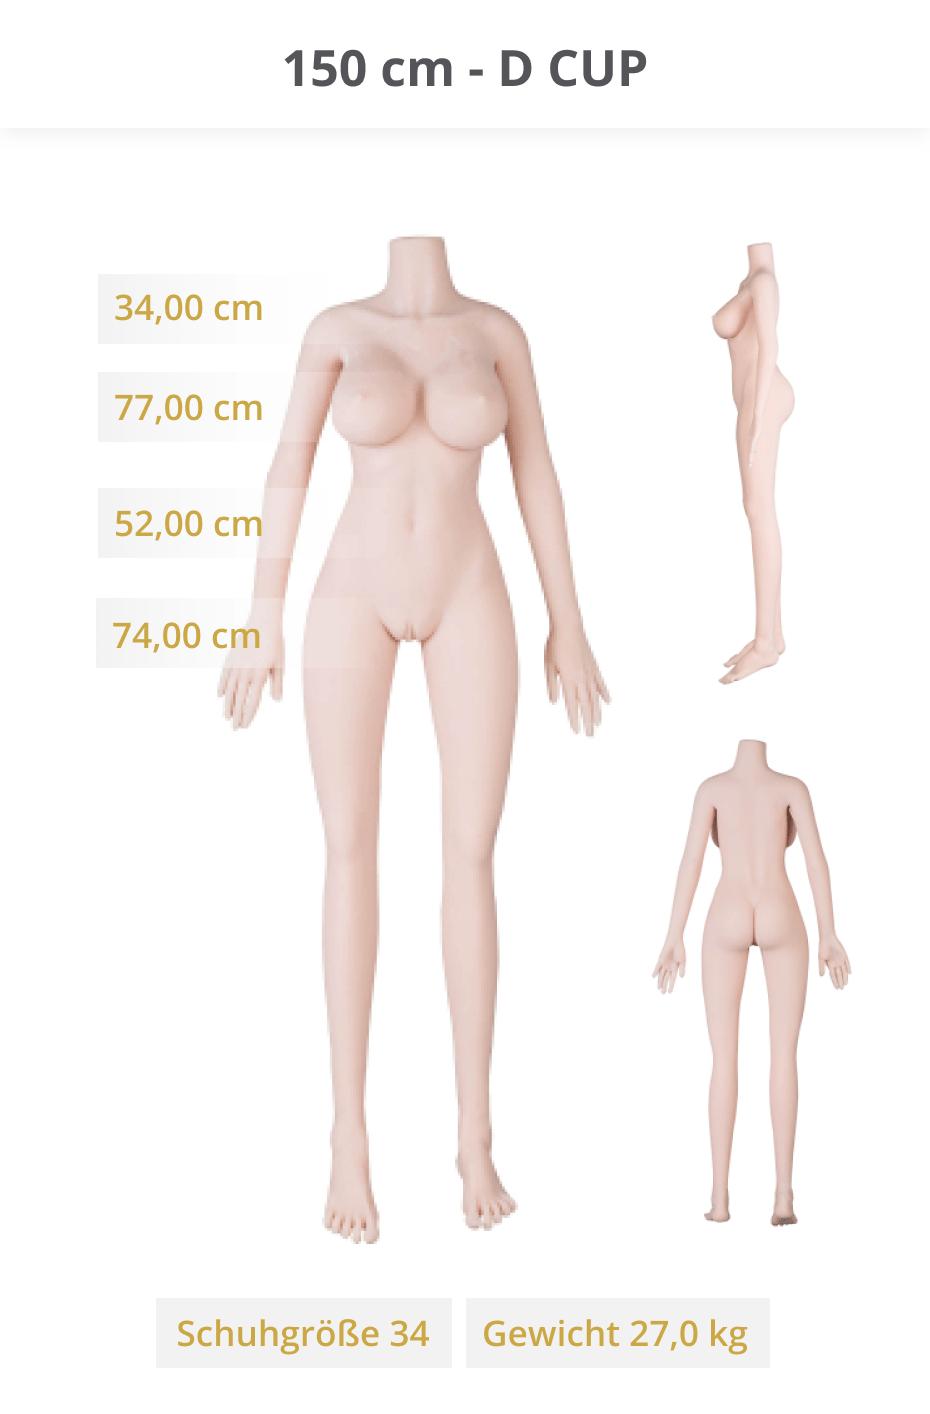 6ye-Dolls-150-cm-D-CUP